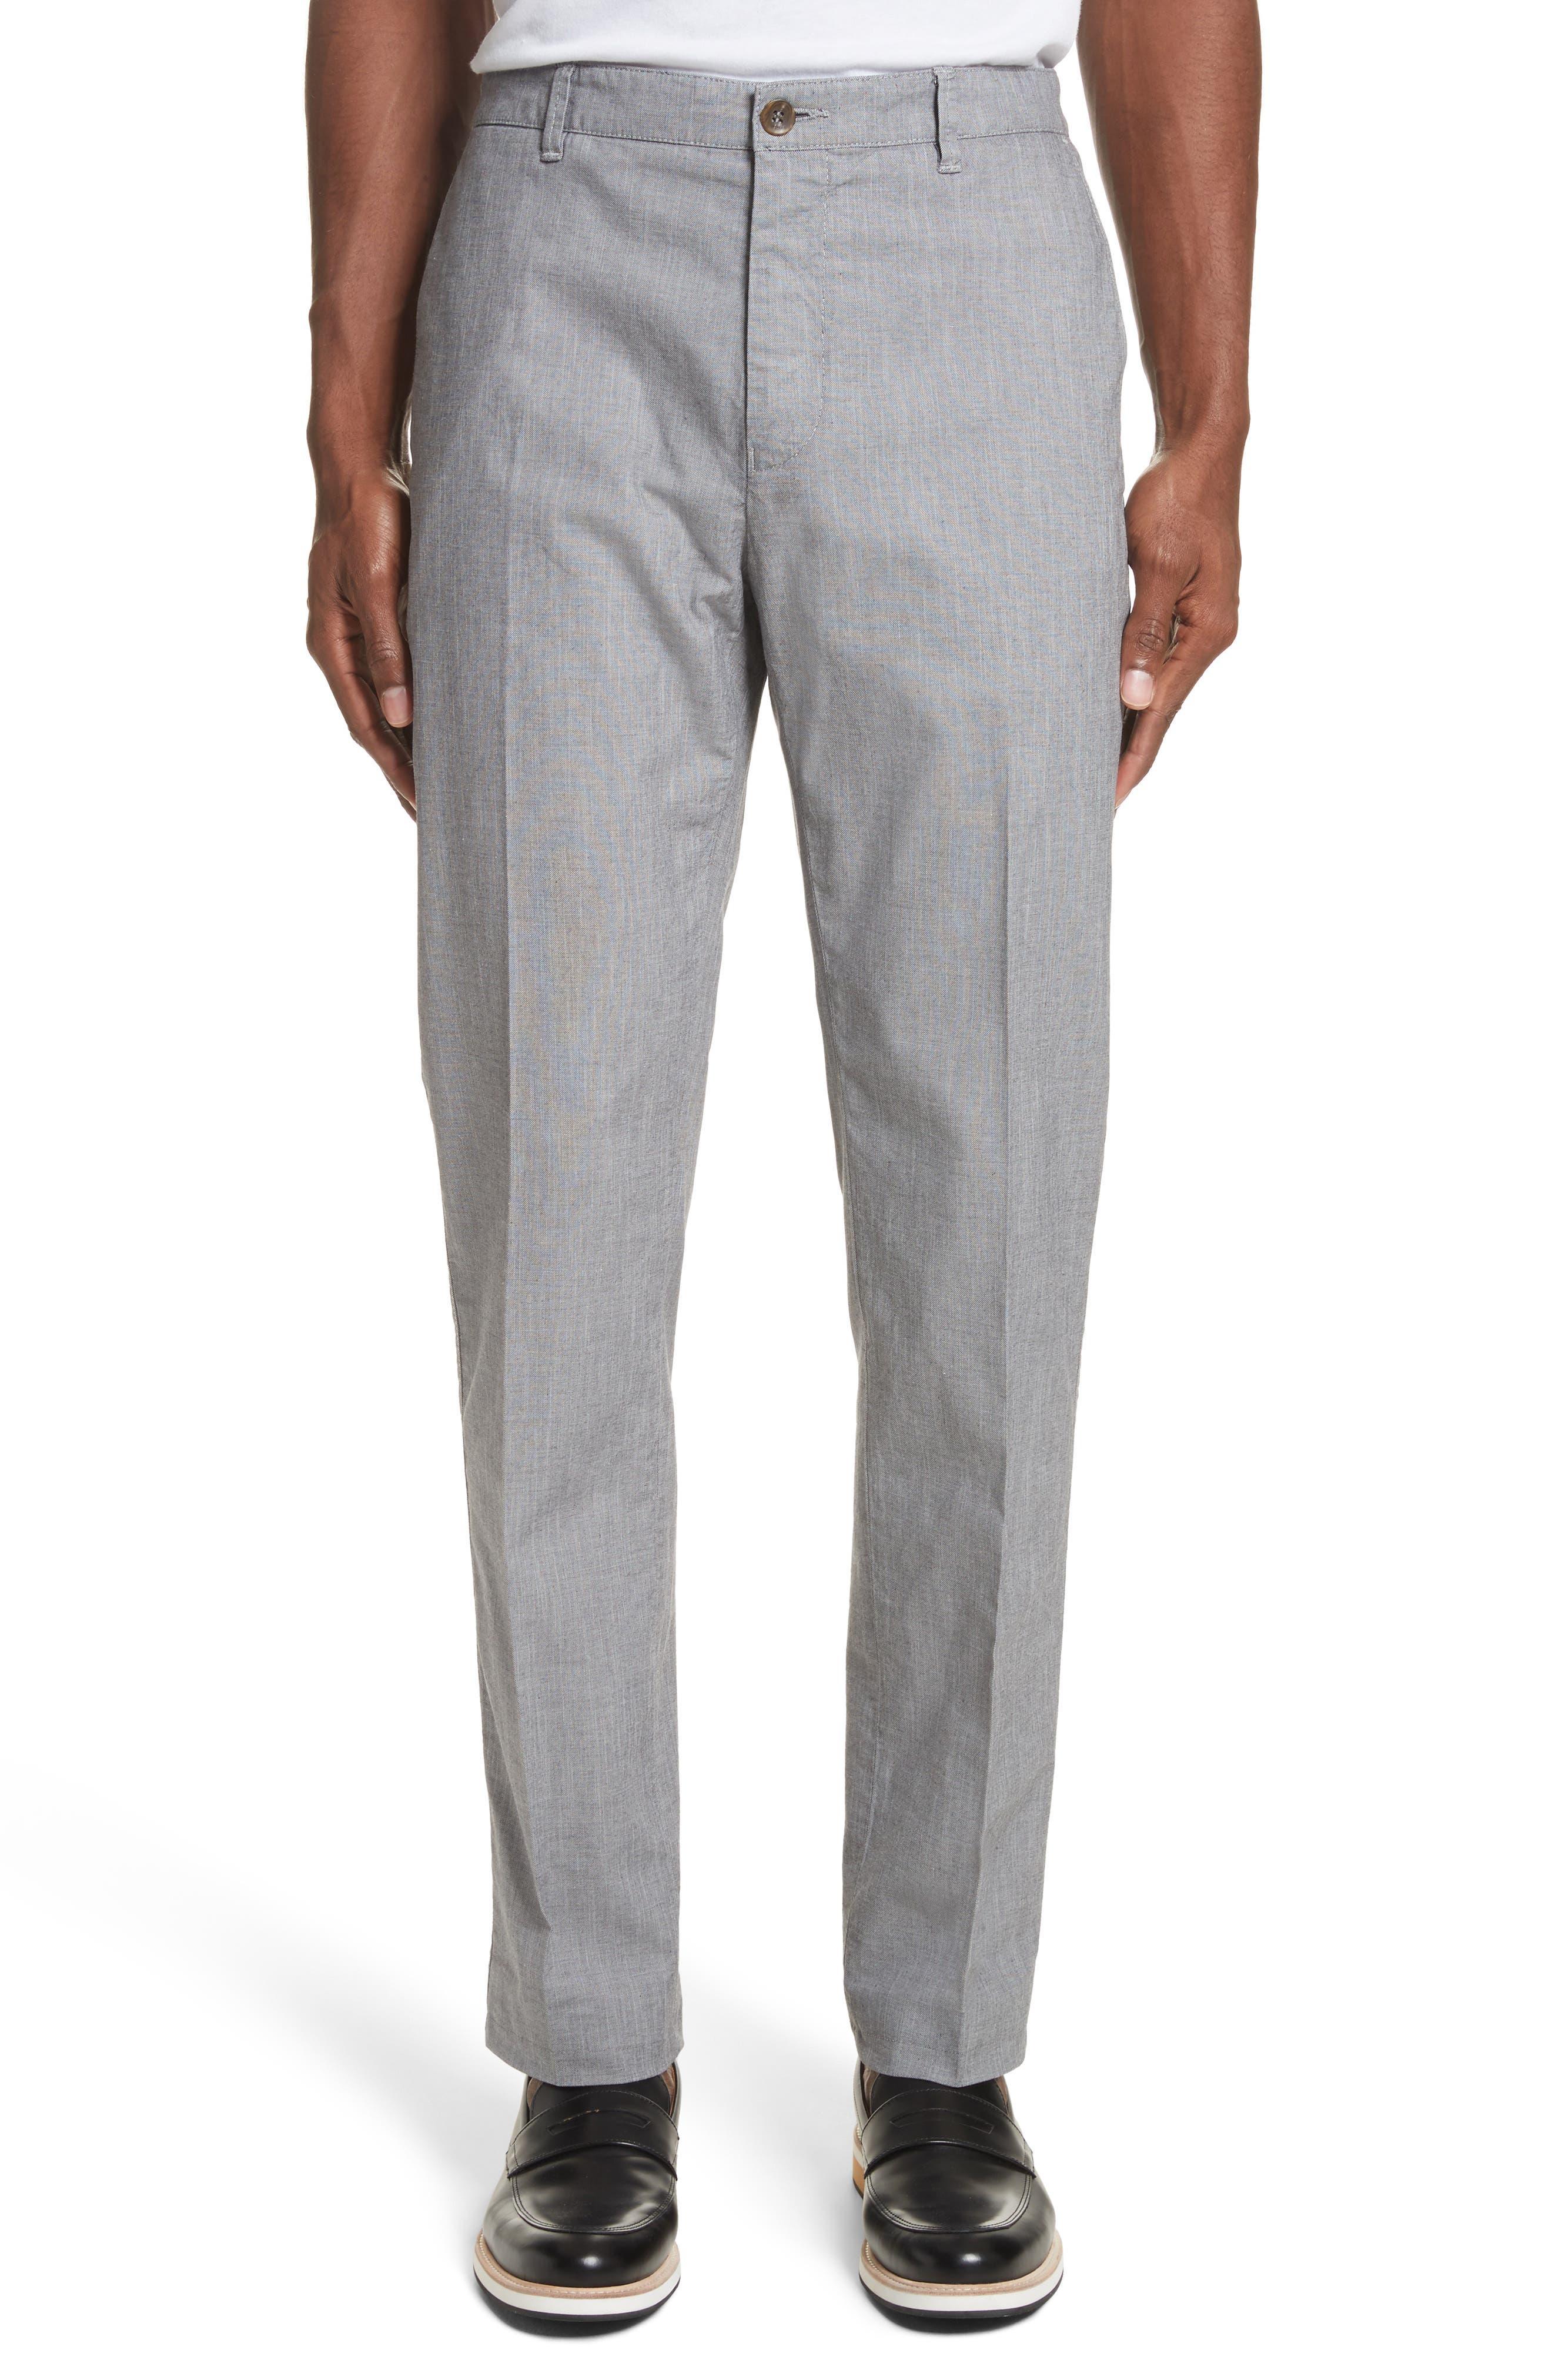 French Pocket Stretch Straight Leg Pants,                             Main thumbnail 1, color,                             Grey